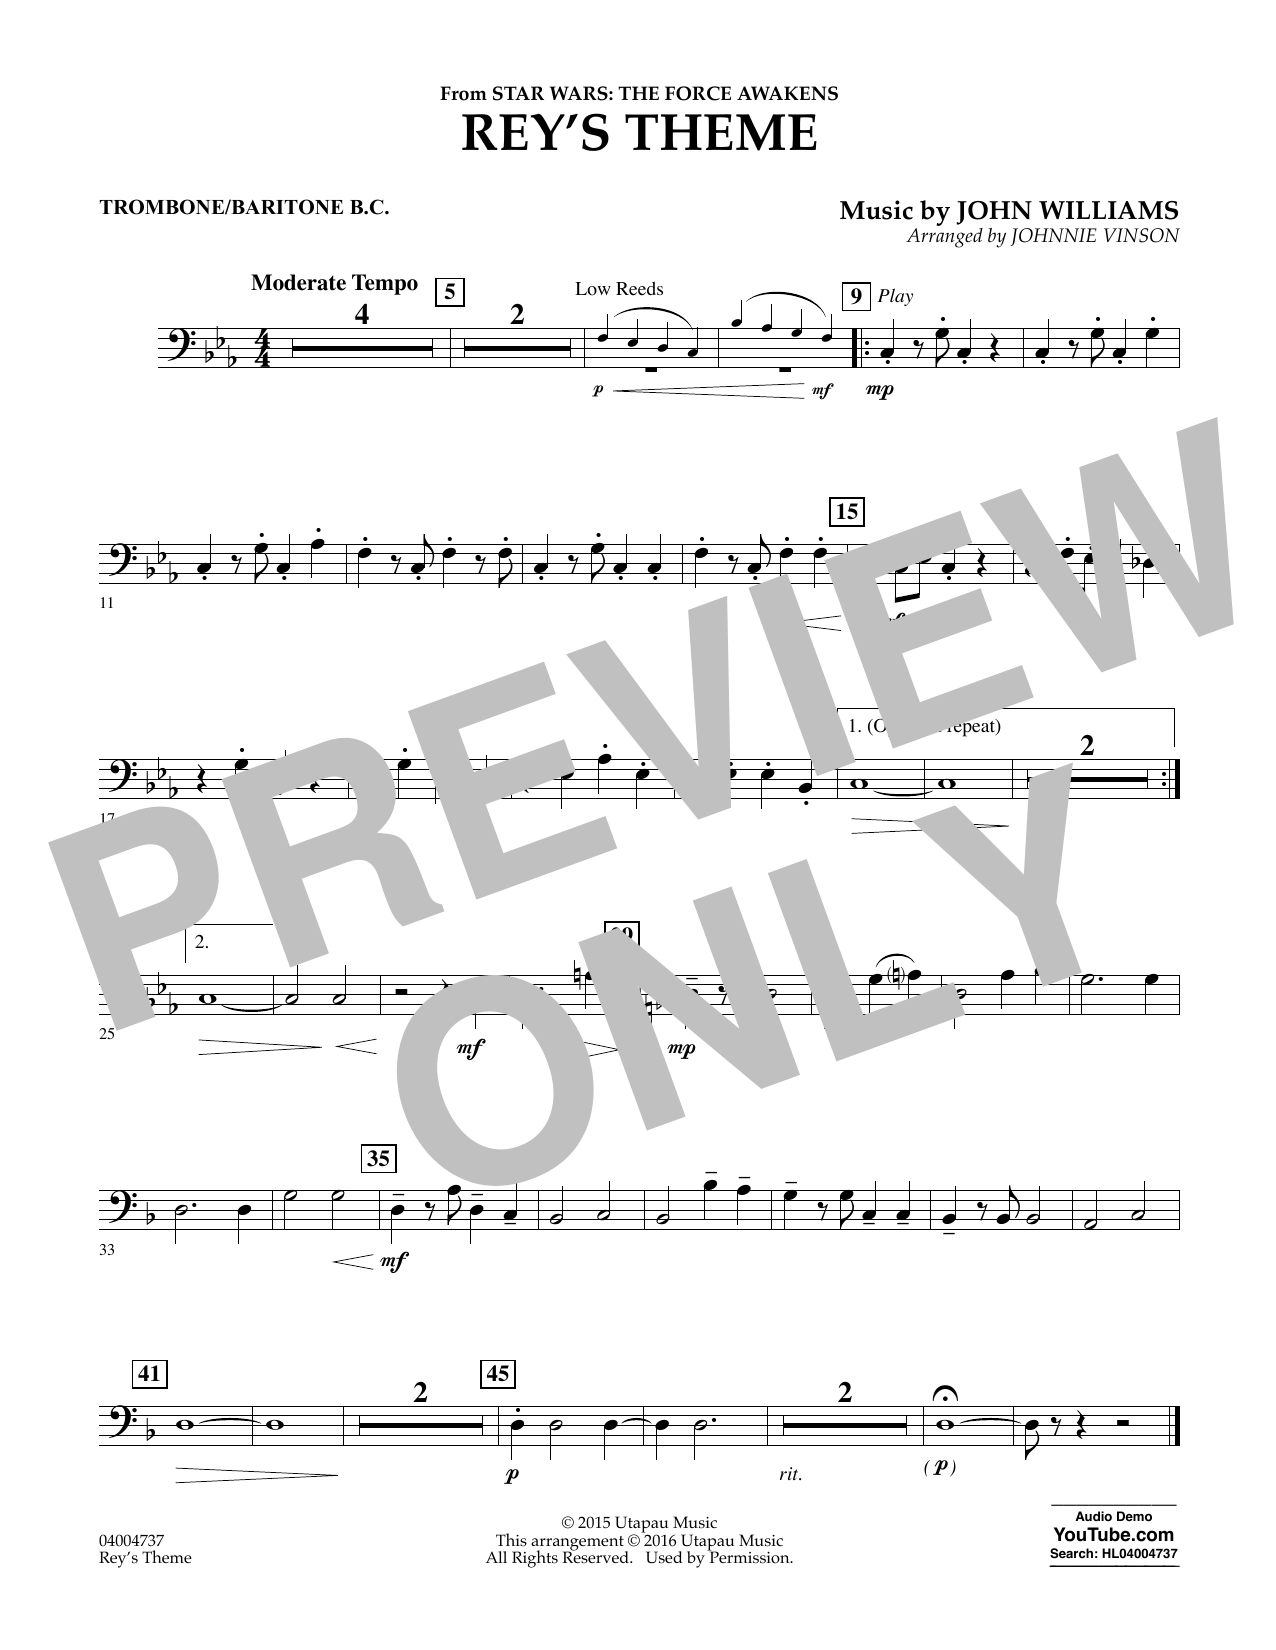 Rey's Theme (from Star Wars: The Force Awakens) - Trombone/Baritone B.C. (Concert Band)